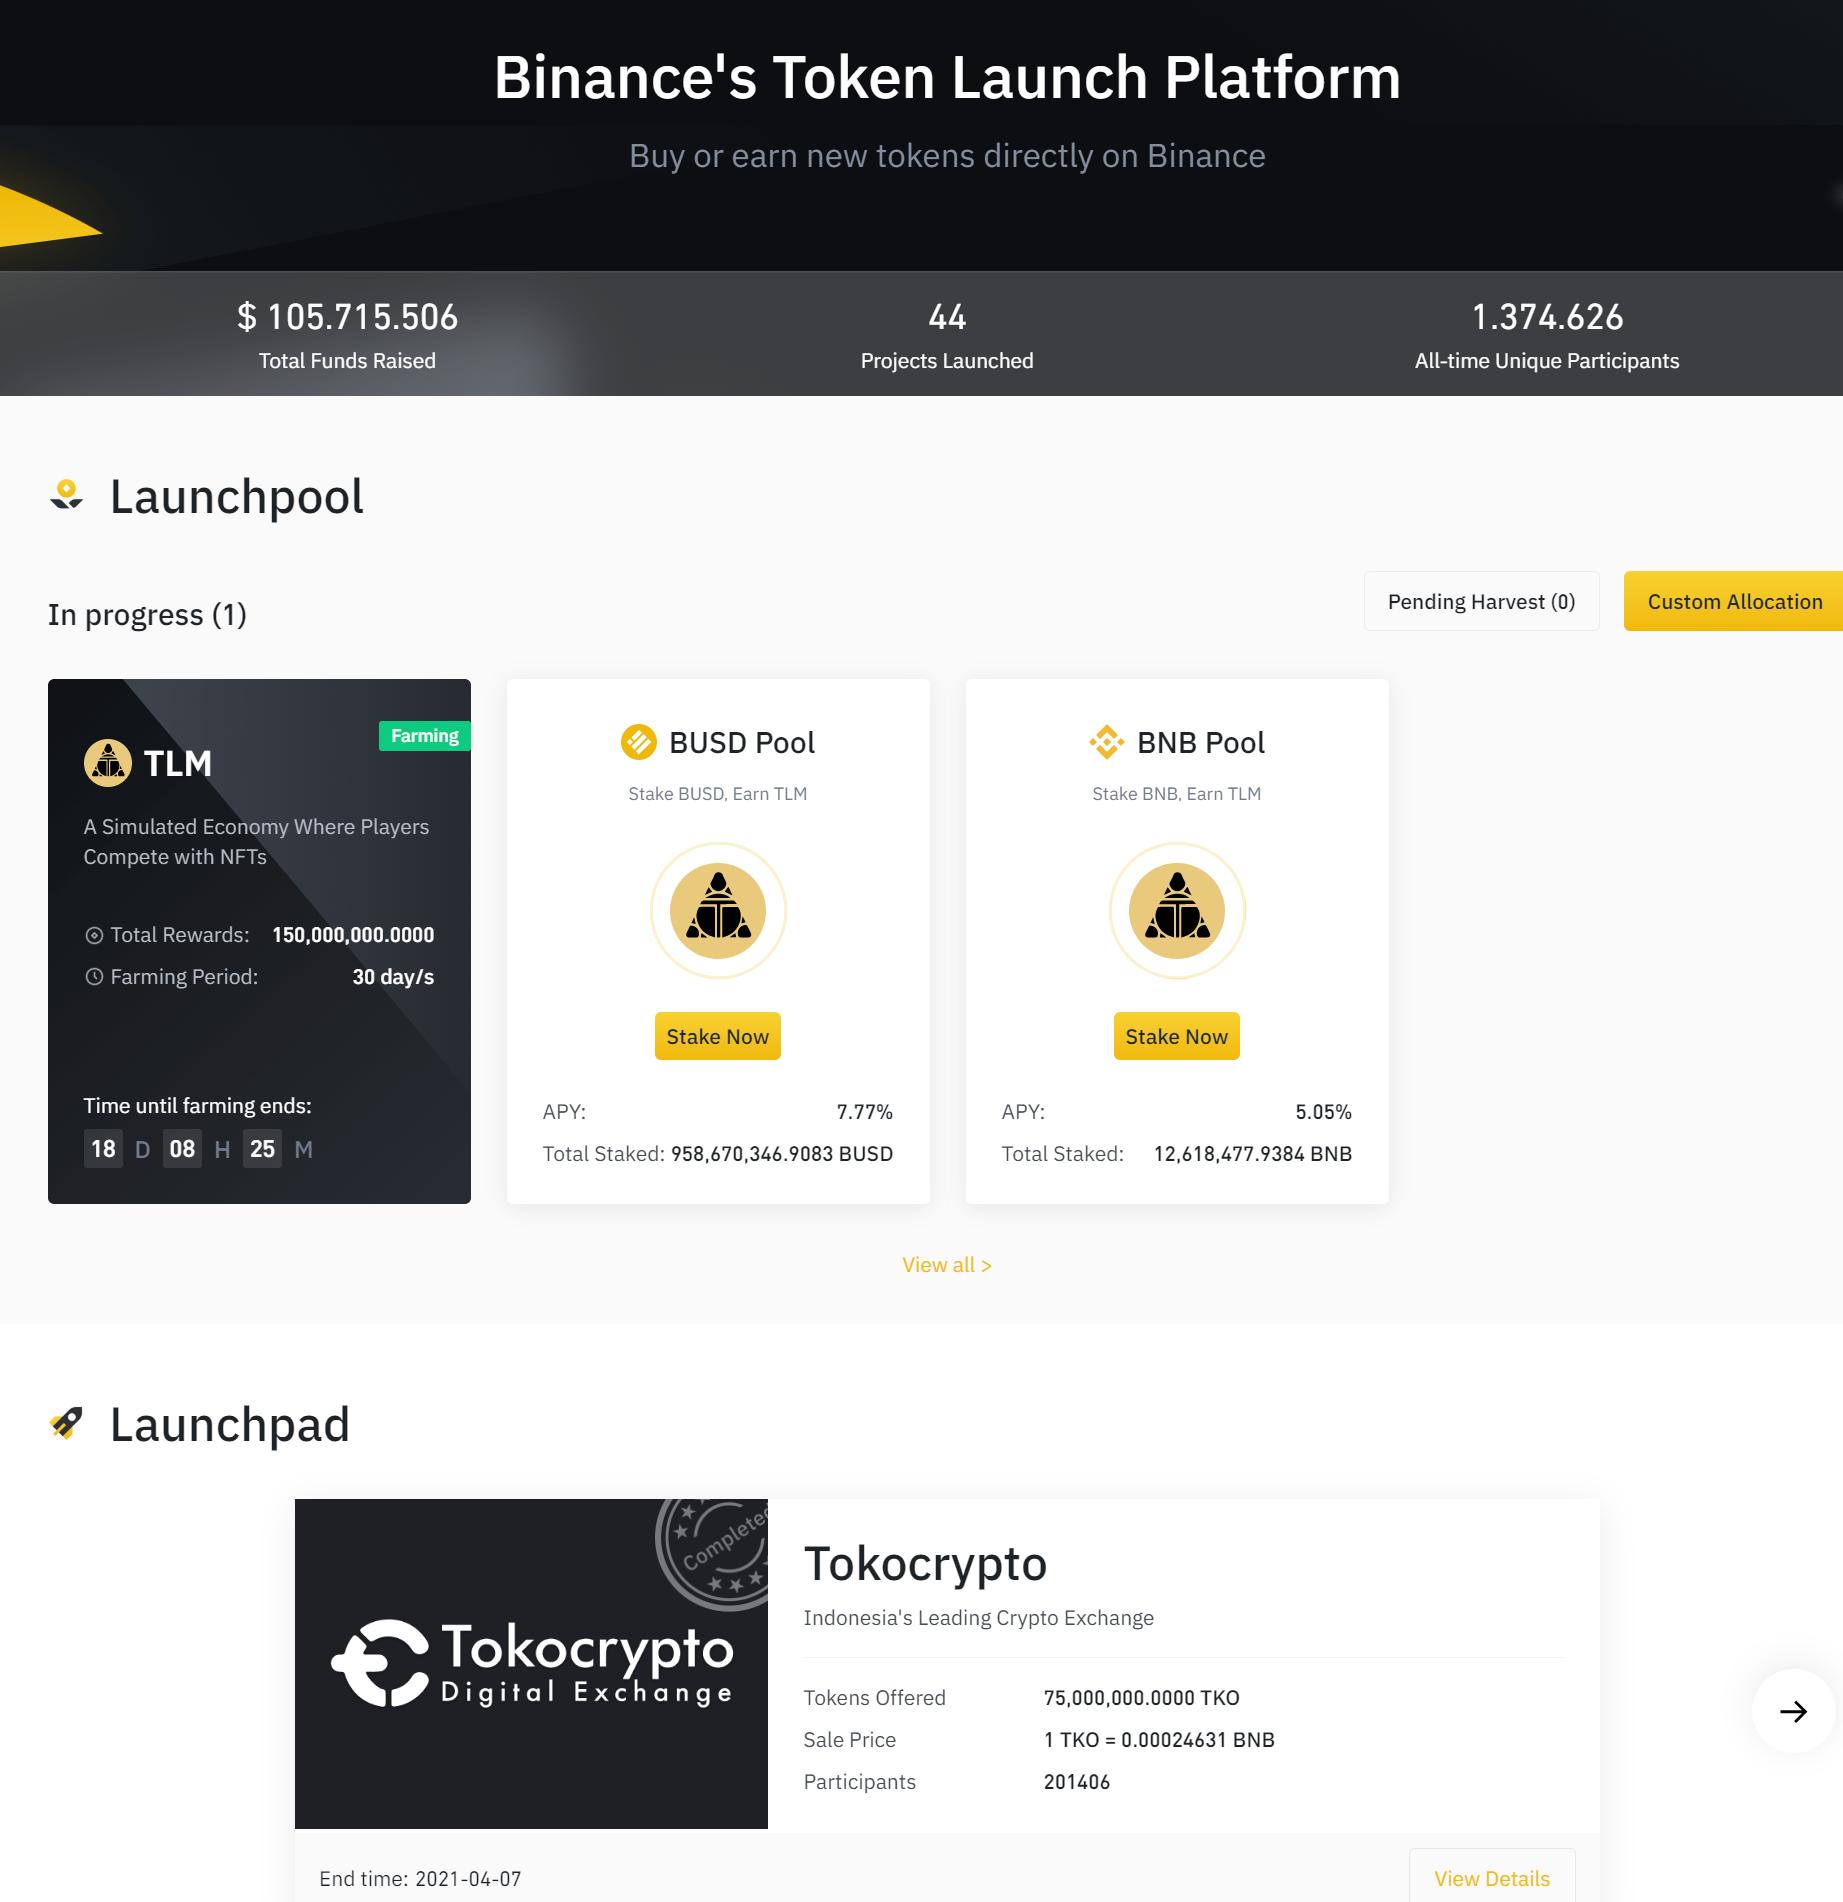 Binance Launch Plattform